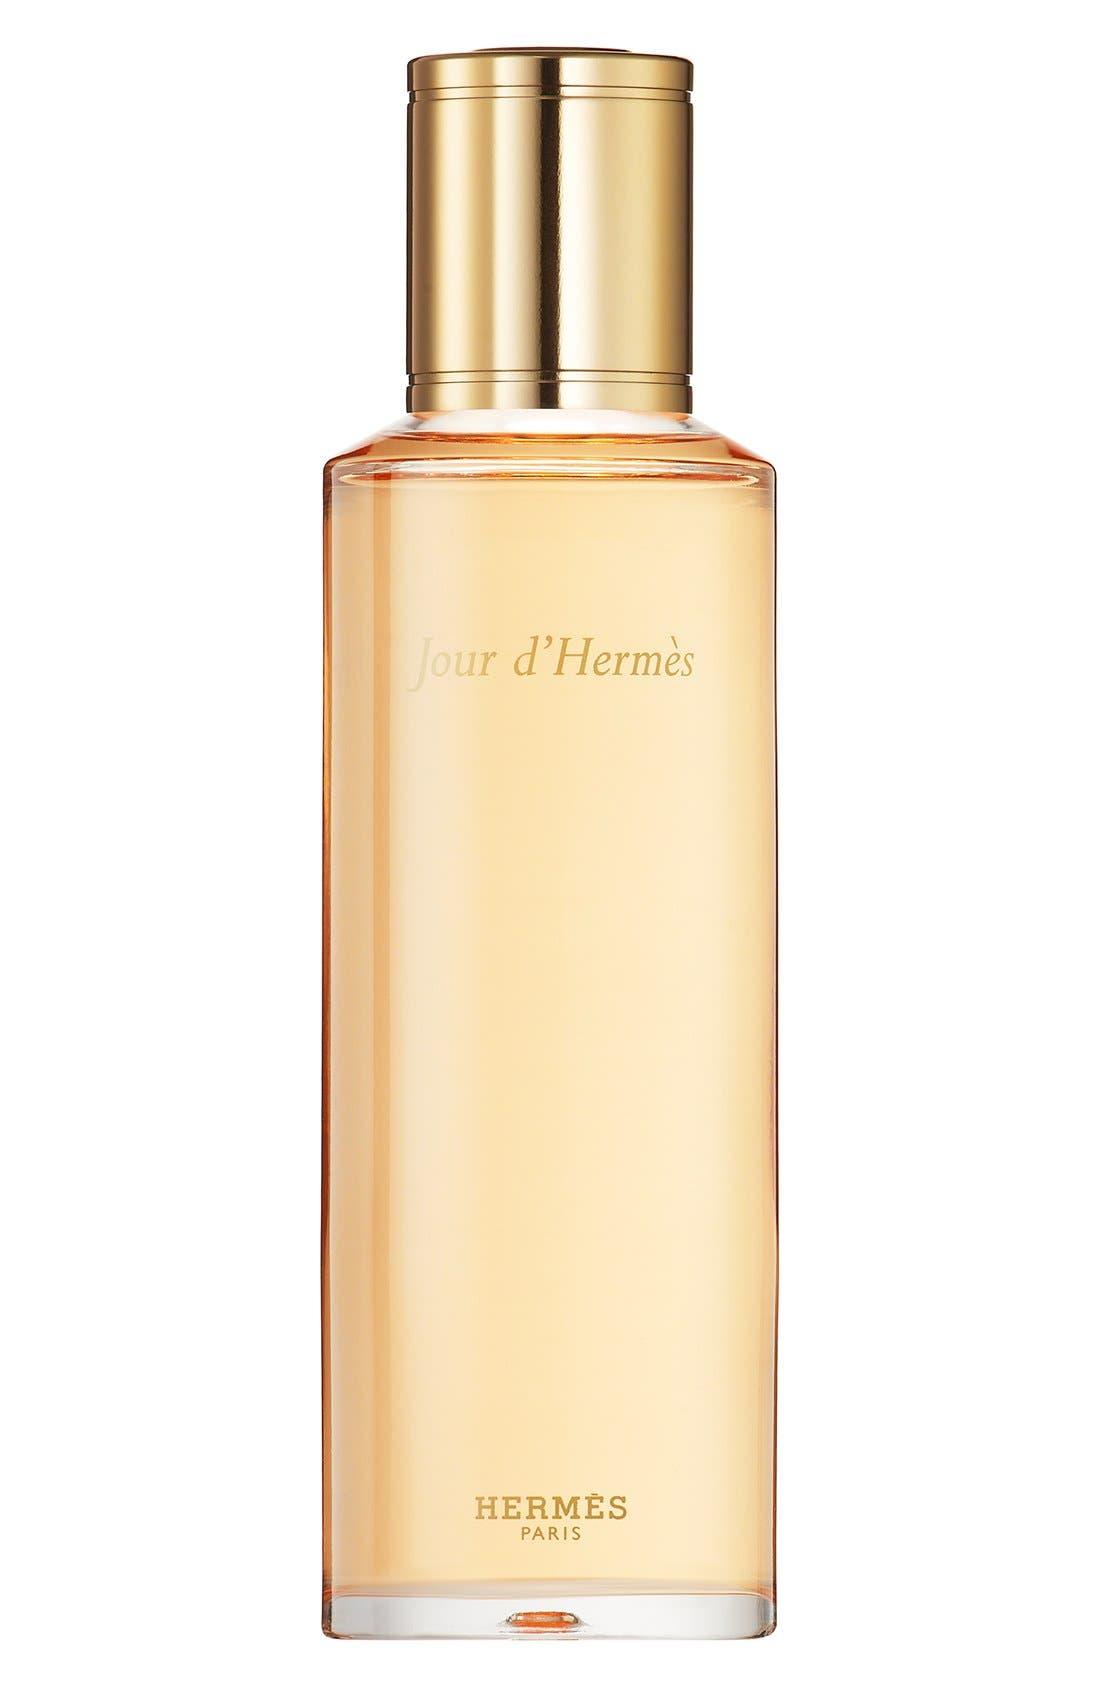 Herms Perfume Cologne Nordstrom Hermes Kelly Caleche For Women Edp 100ml